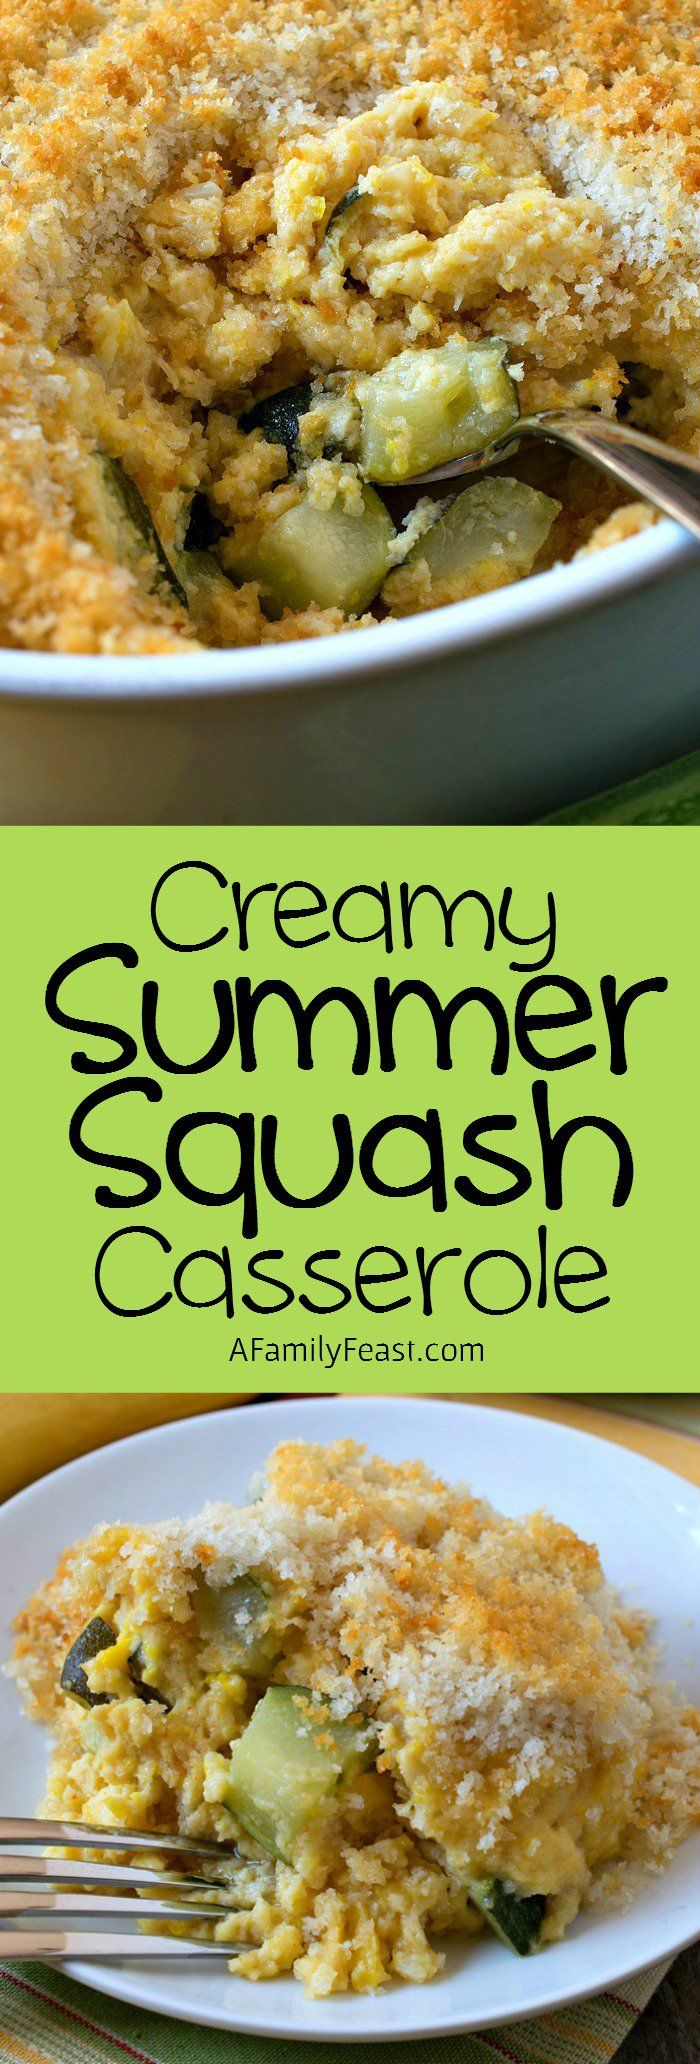 Creamy Summer Squash Casserole Recipe Summer squash